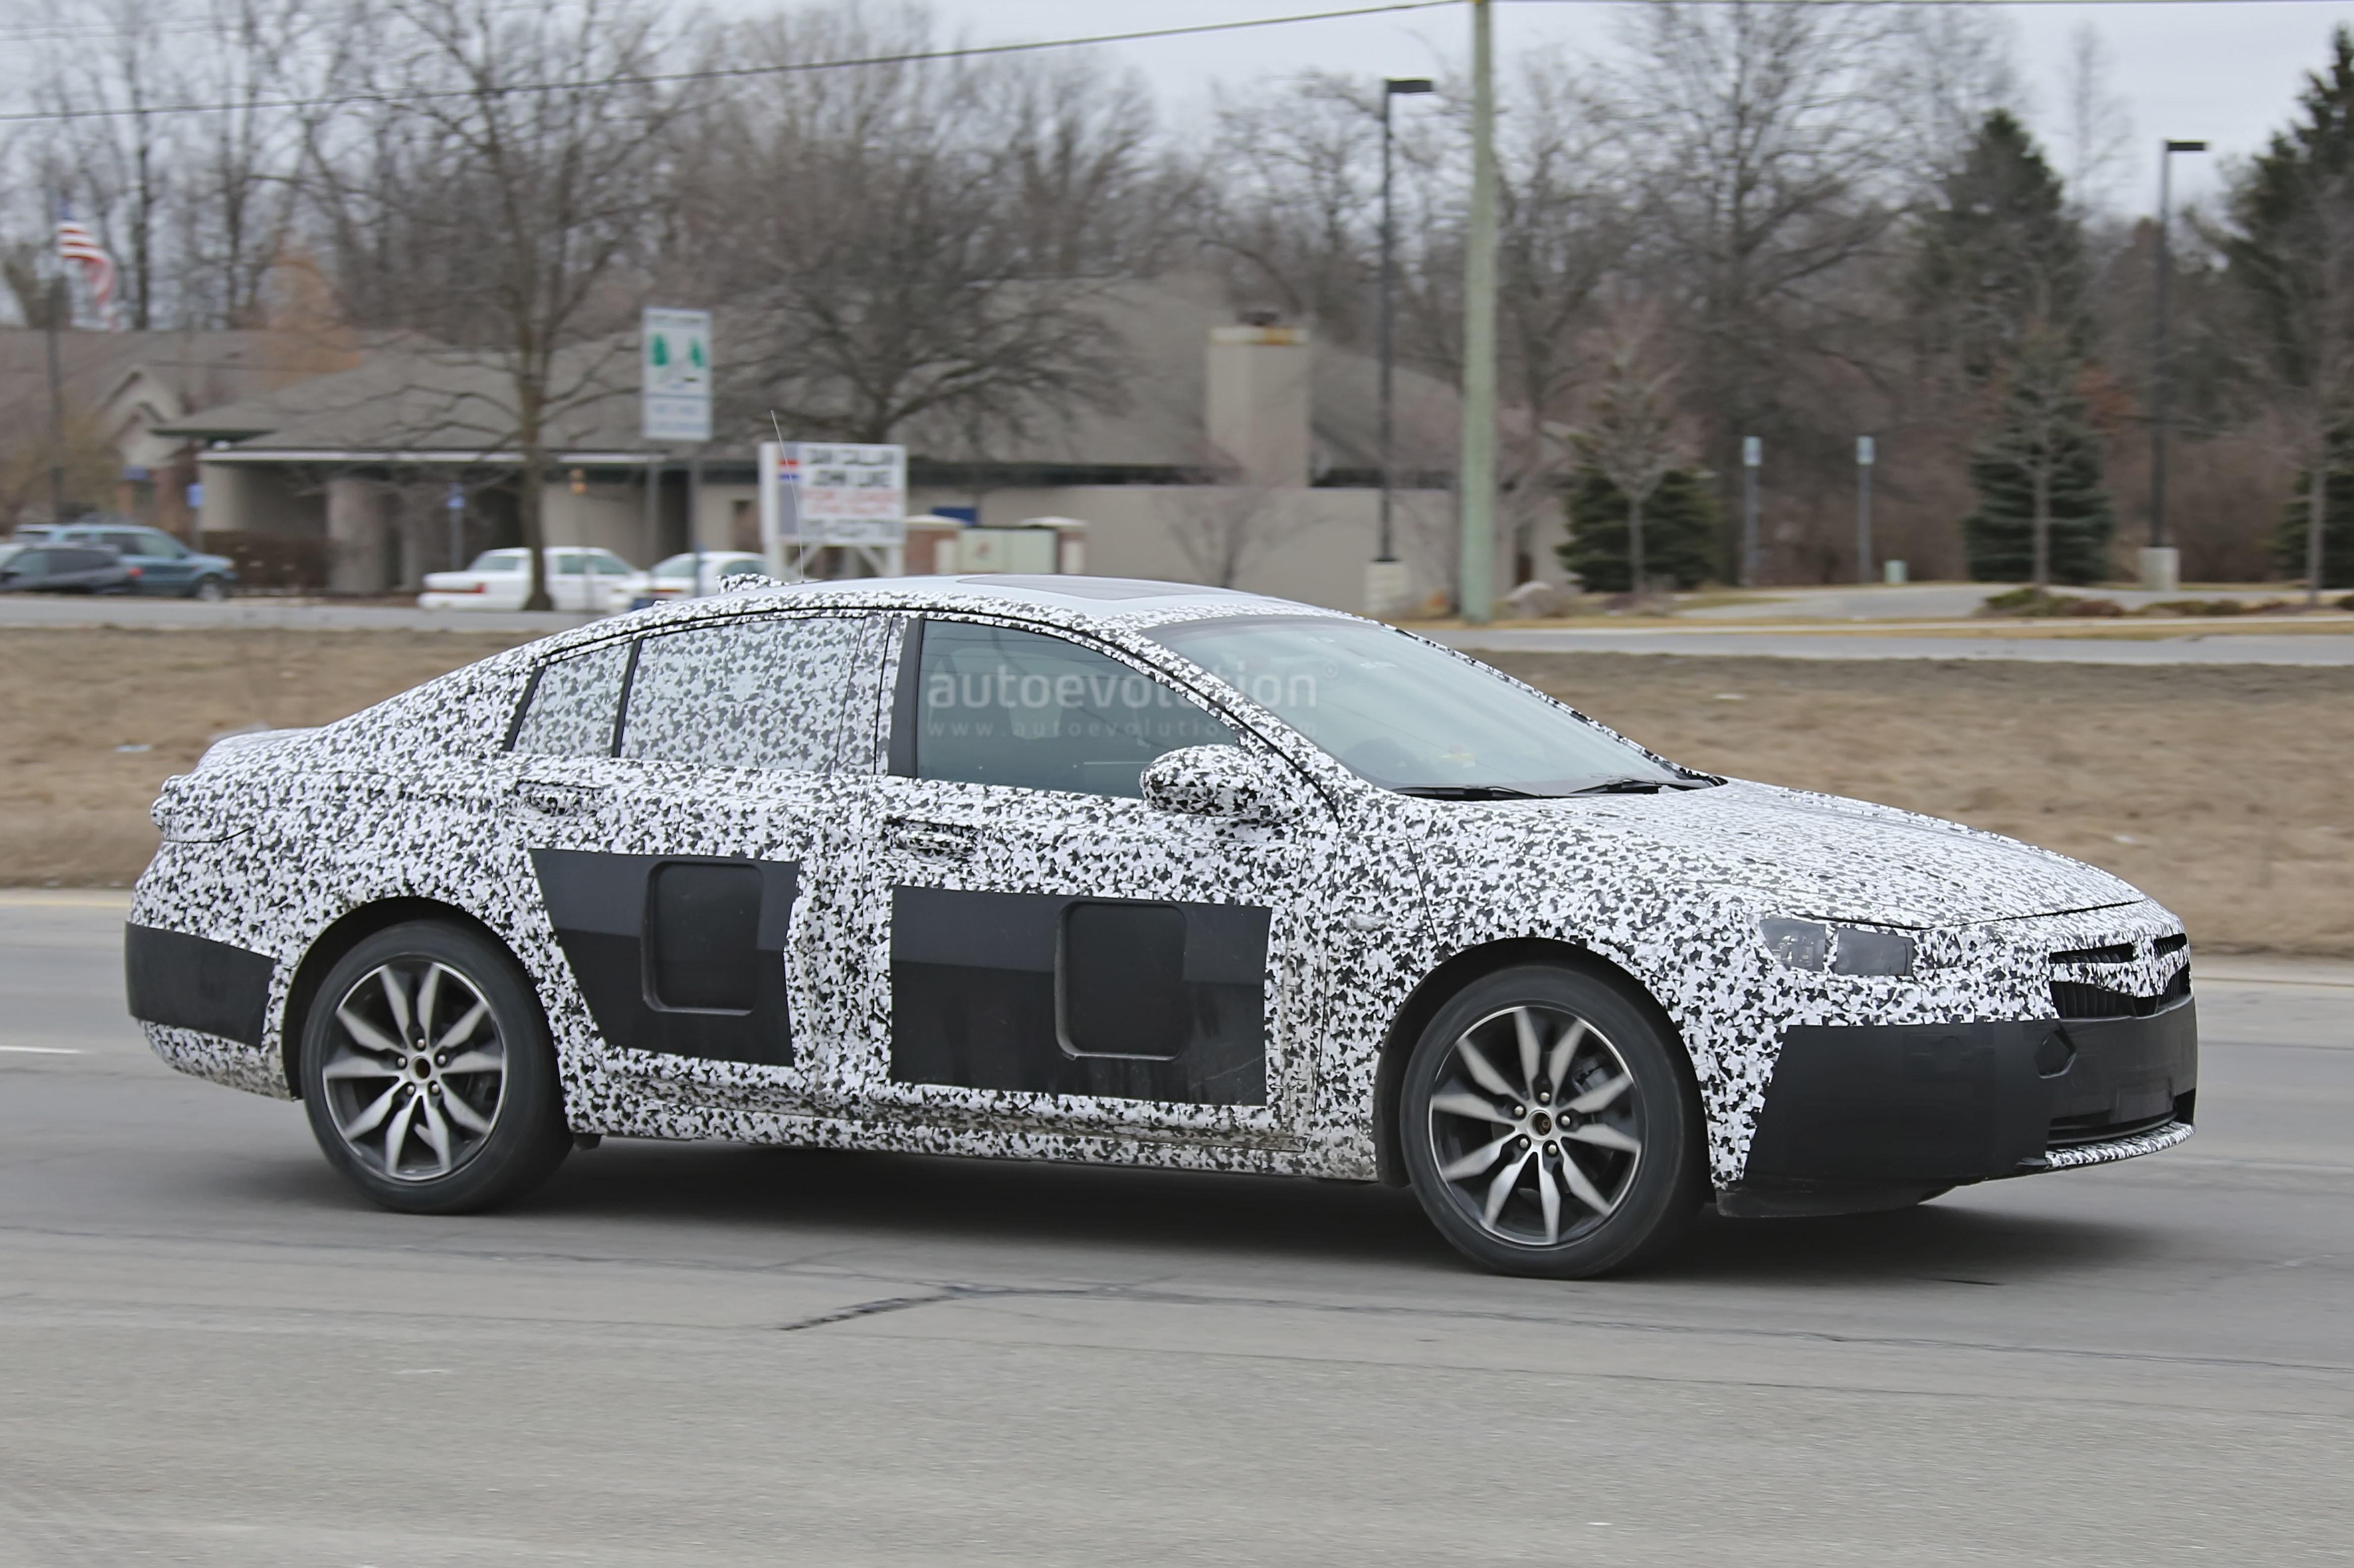 2018 Buick Regal (8) | SUV News and Analysis